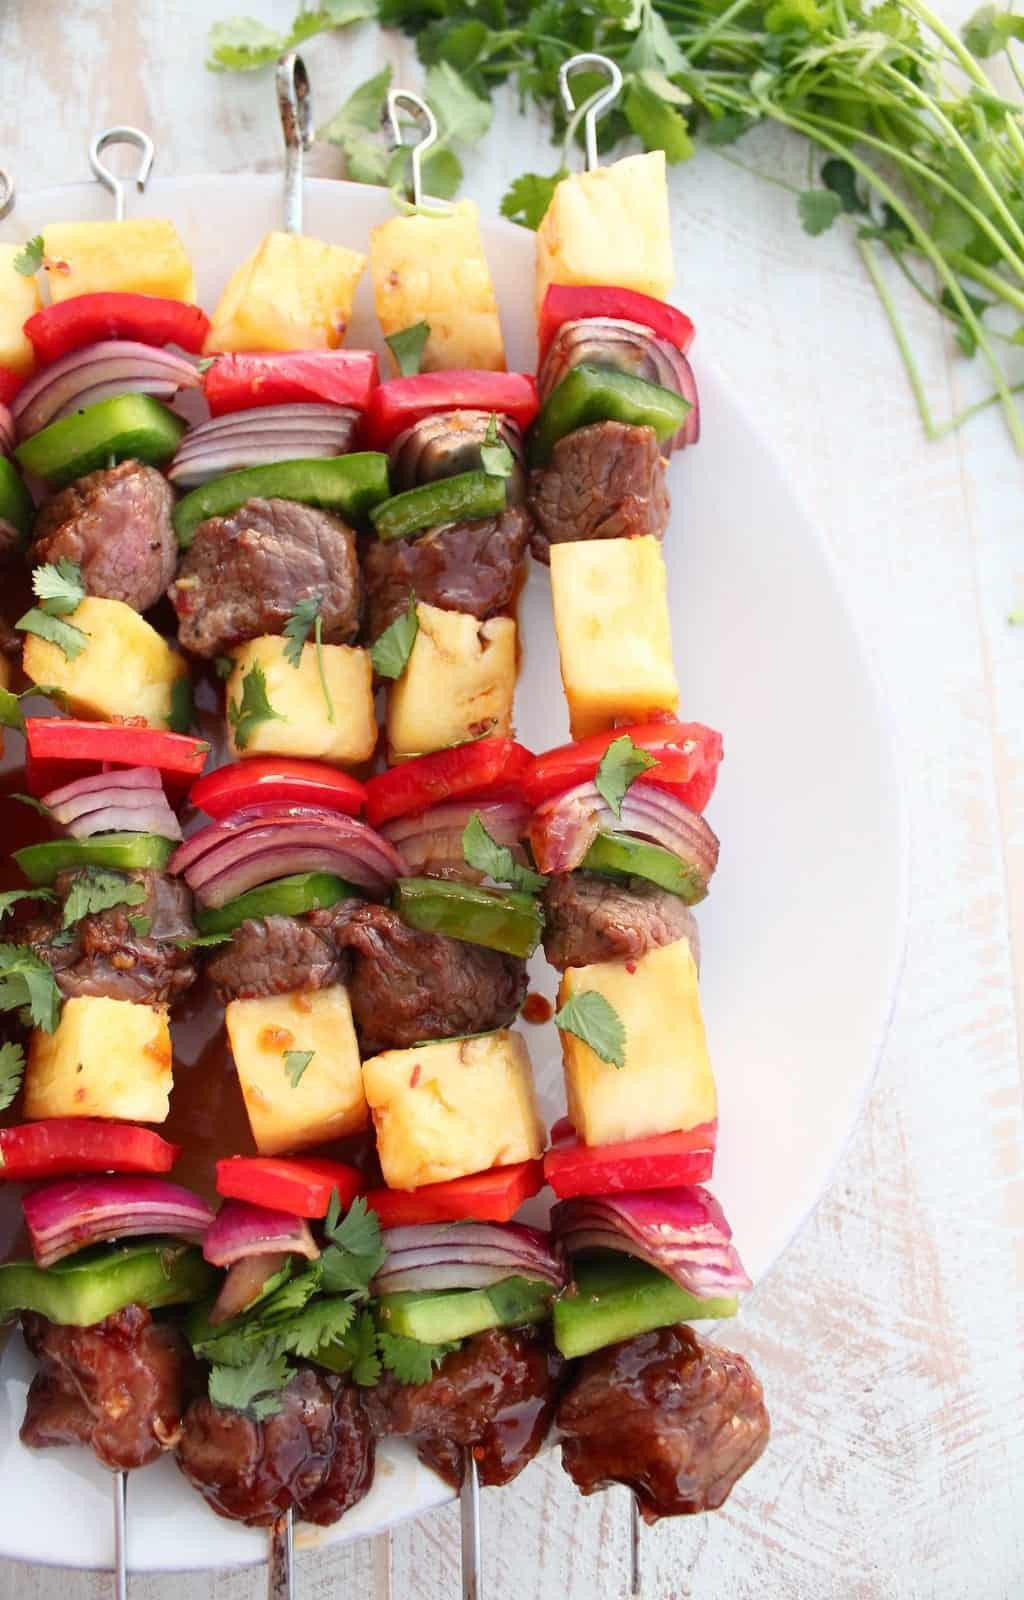 Teriyaki Steak Shish Kabob Recipe Whitneybond Com